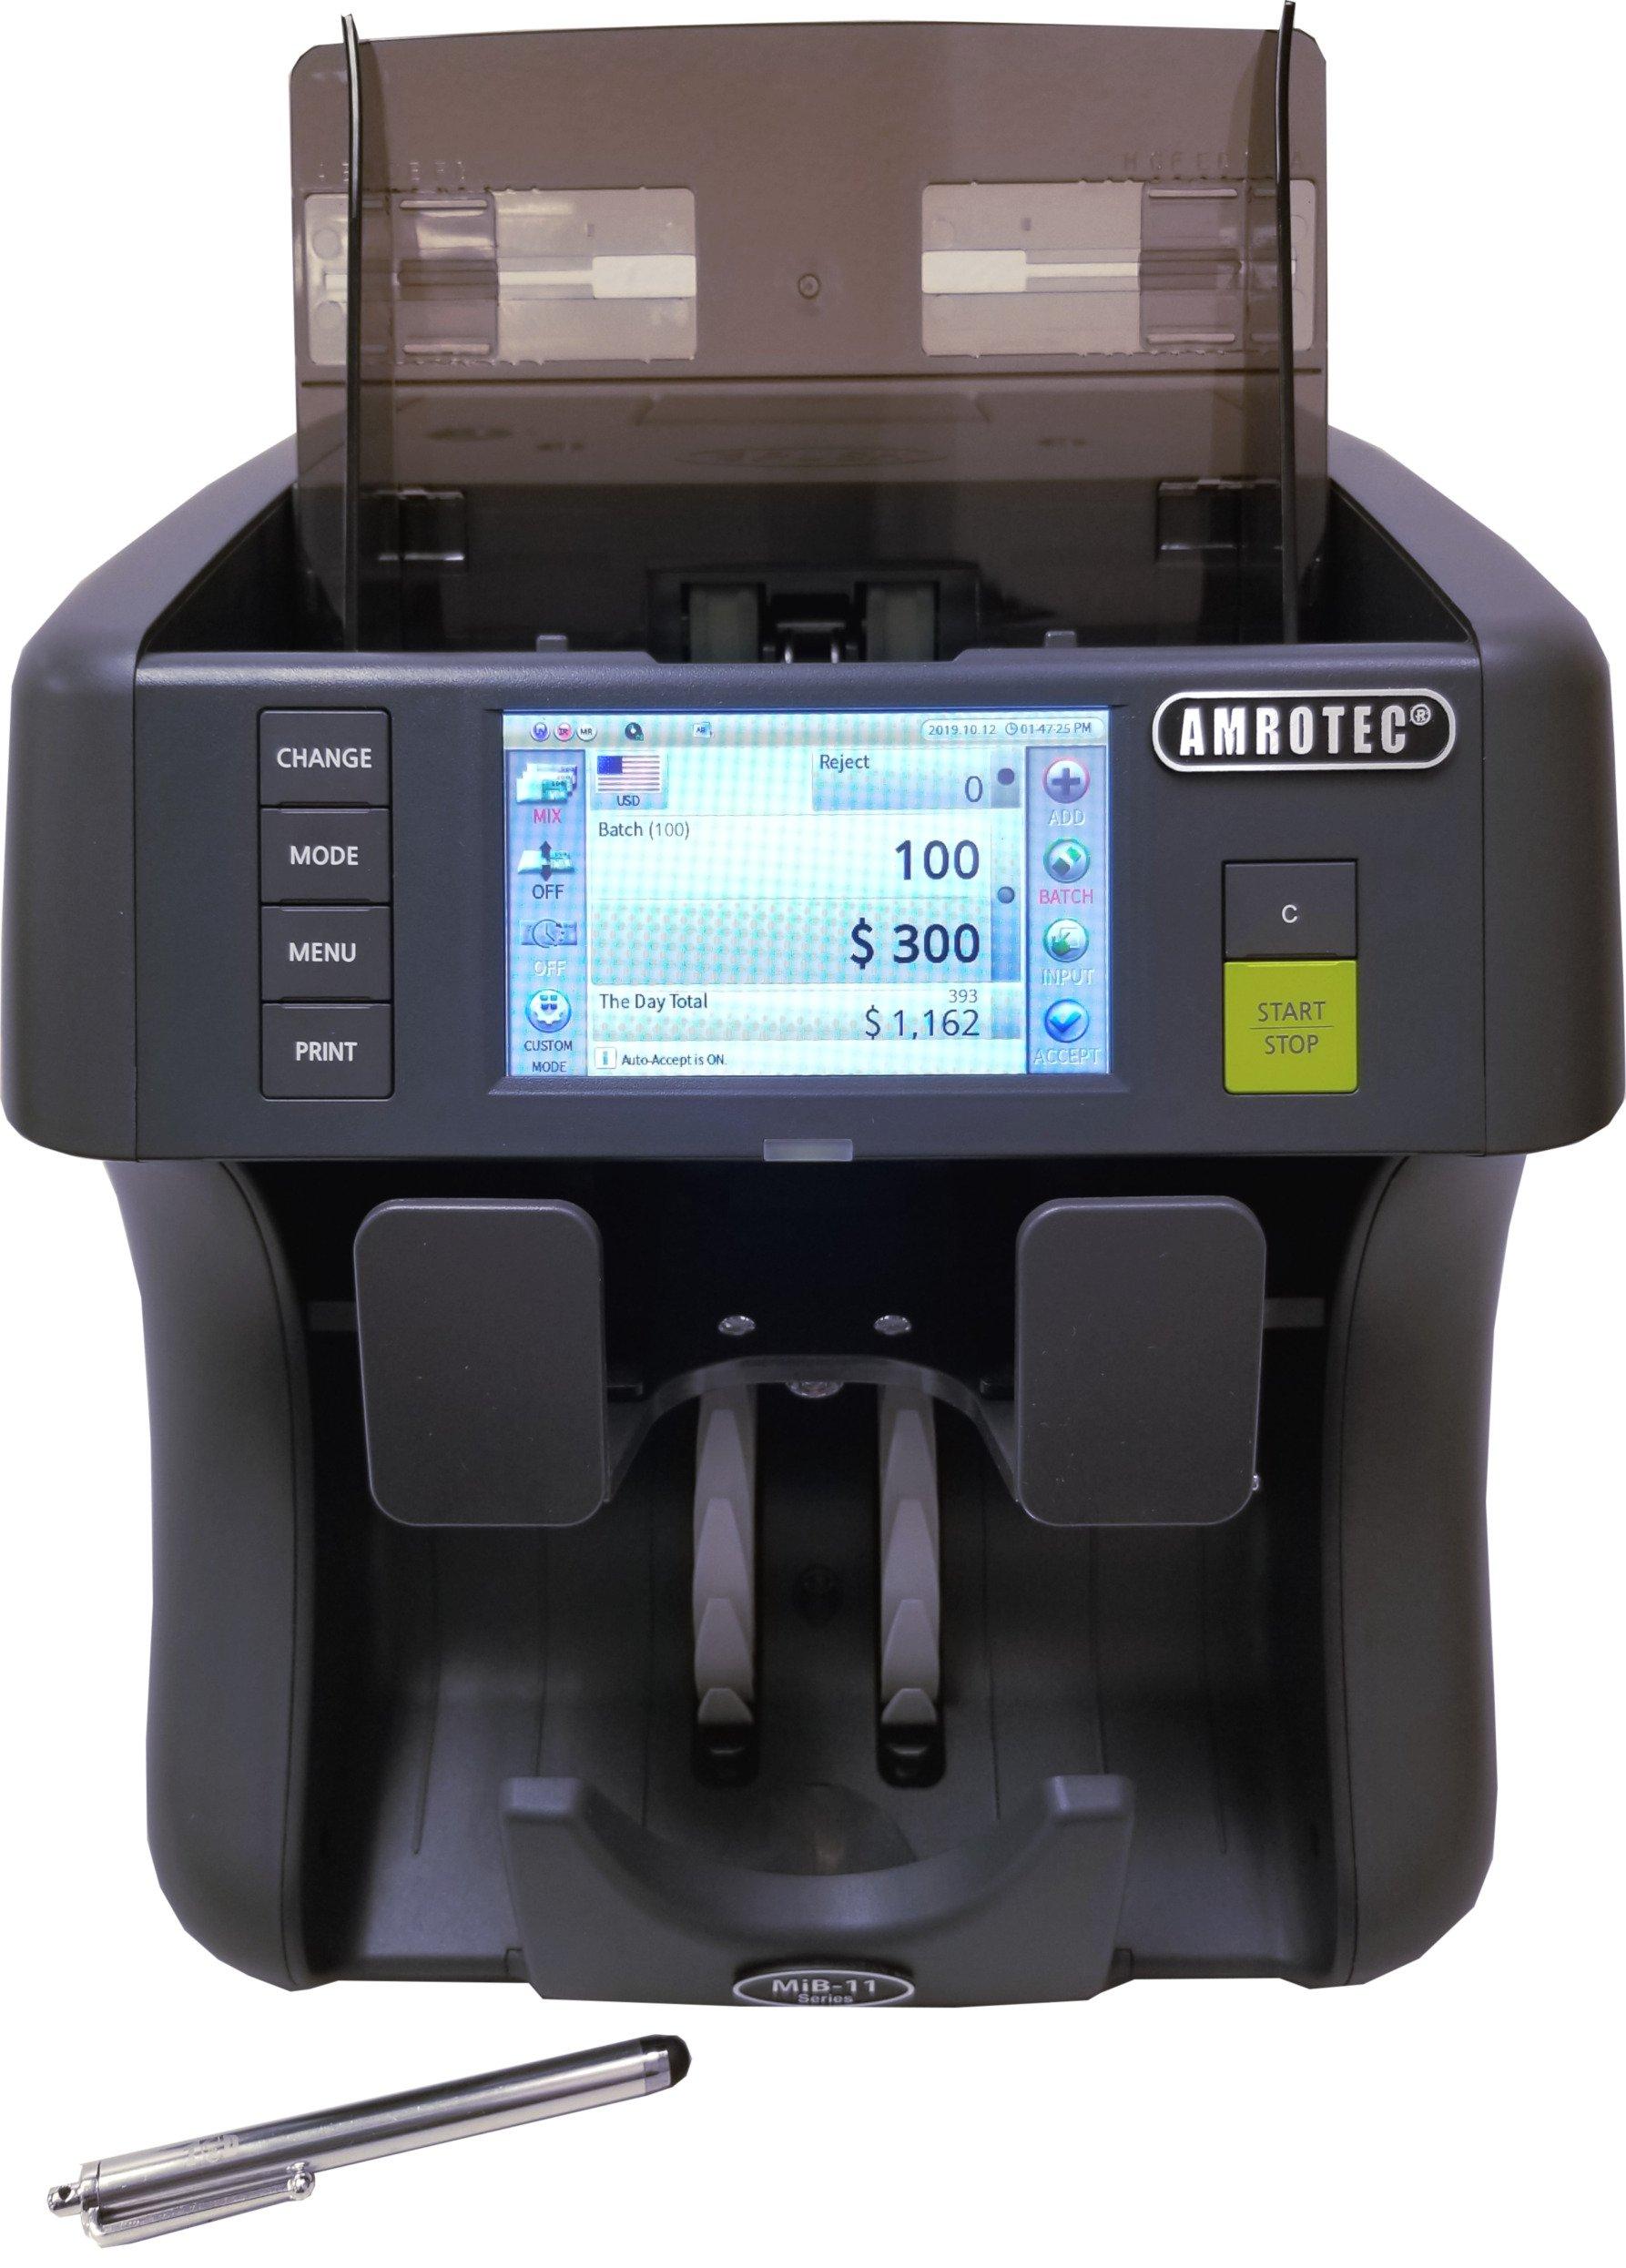 Amrotec MIB-11